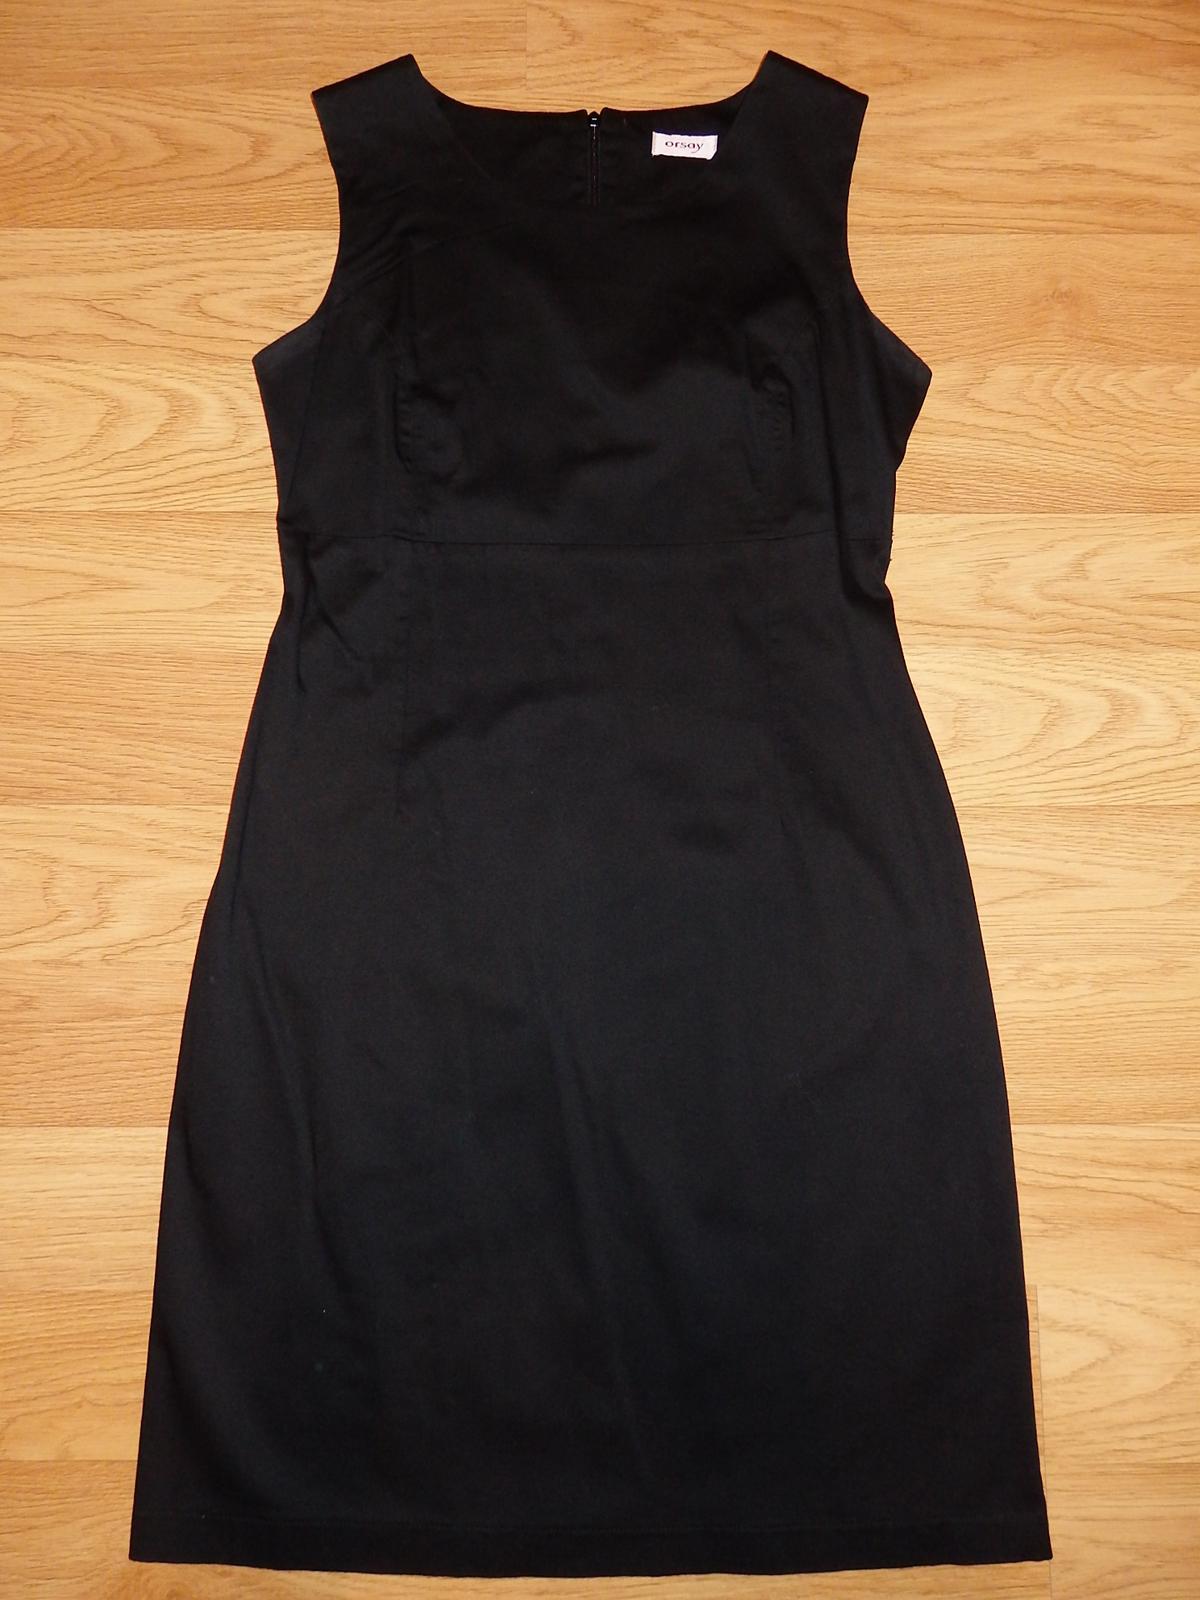 Puzdrové business šaty - Obrázok č. 1